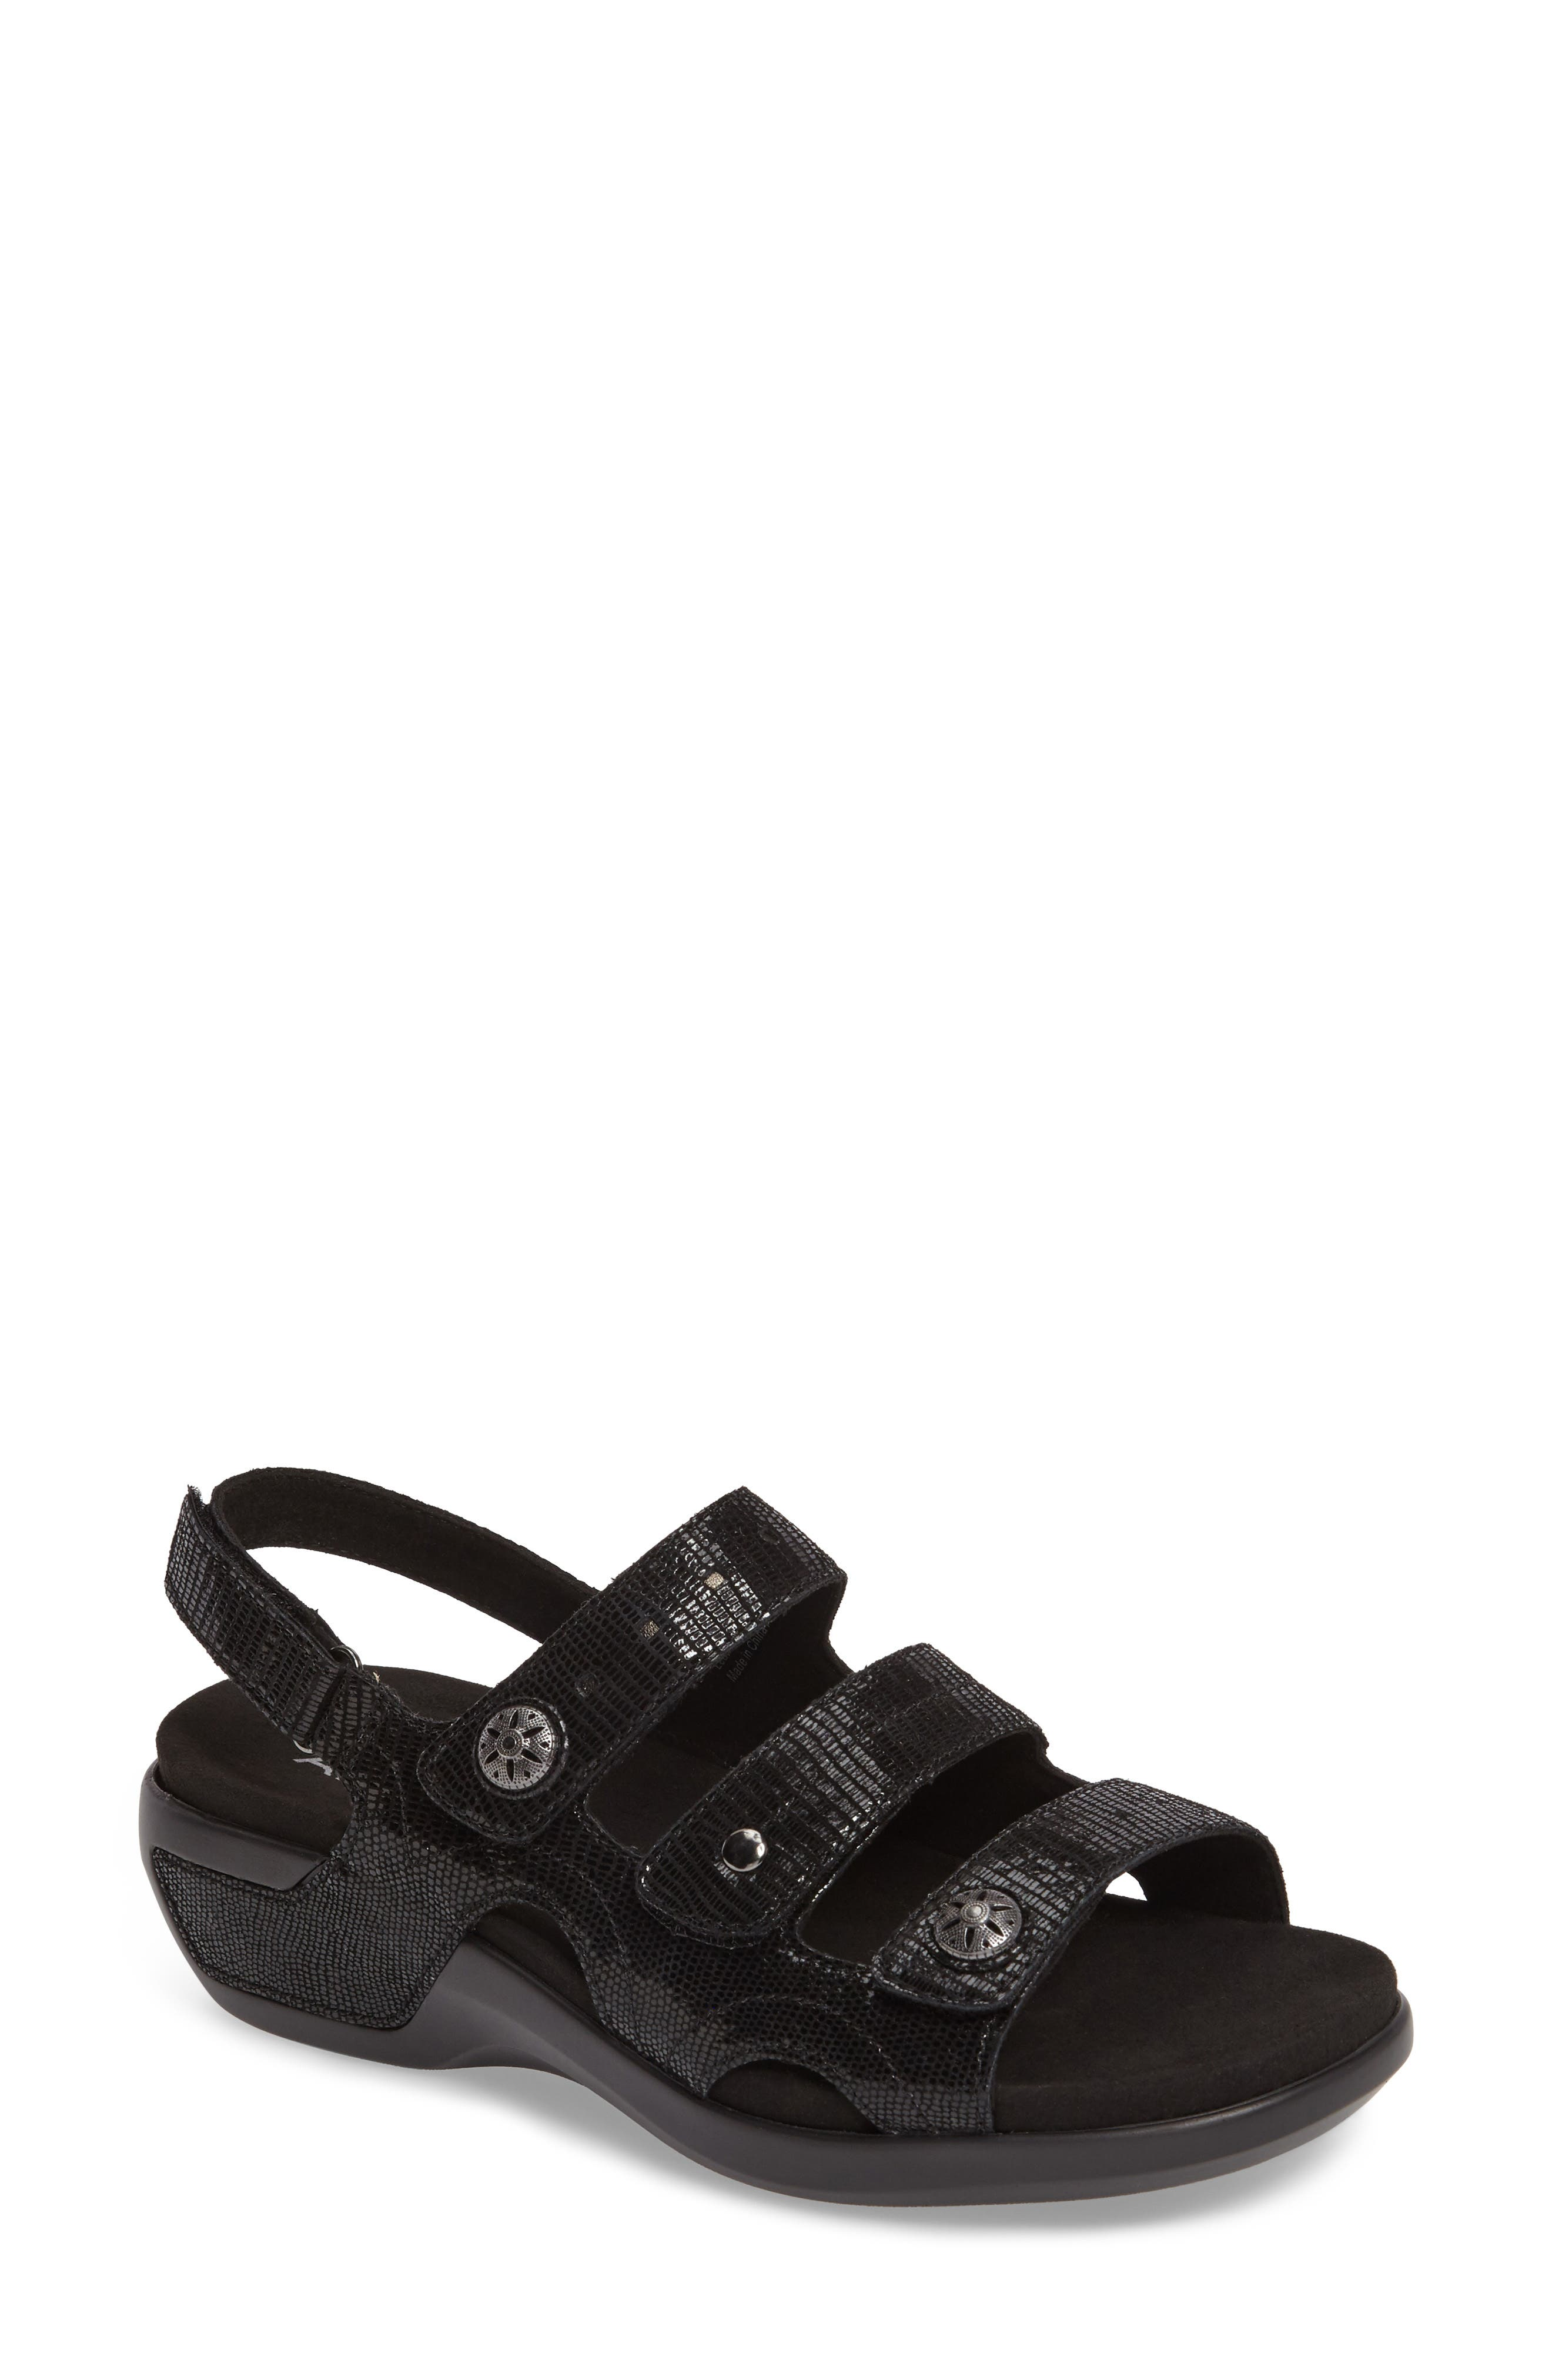 PC Wedge Sandal,                             Main thumbnail 1, color,                             BLACK FABRIC